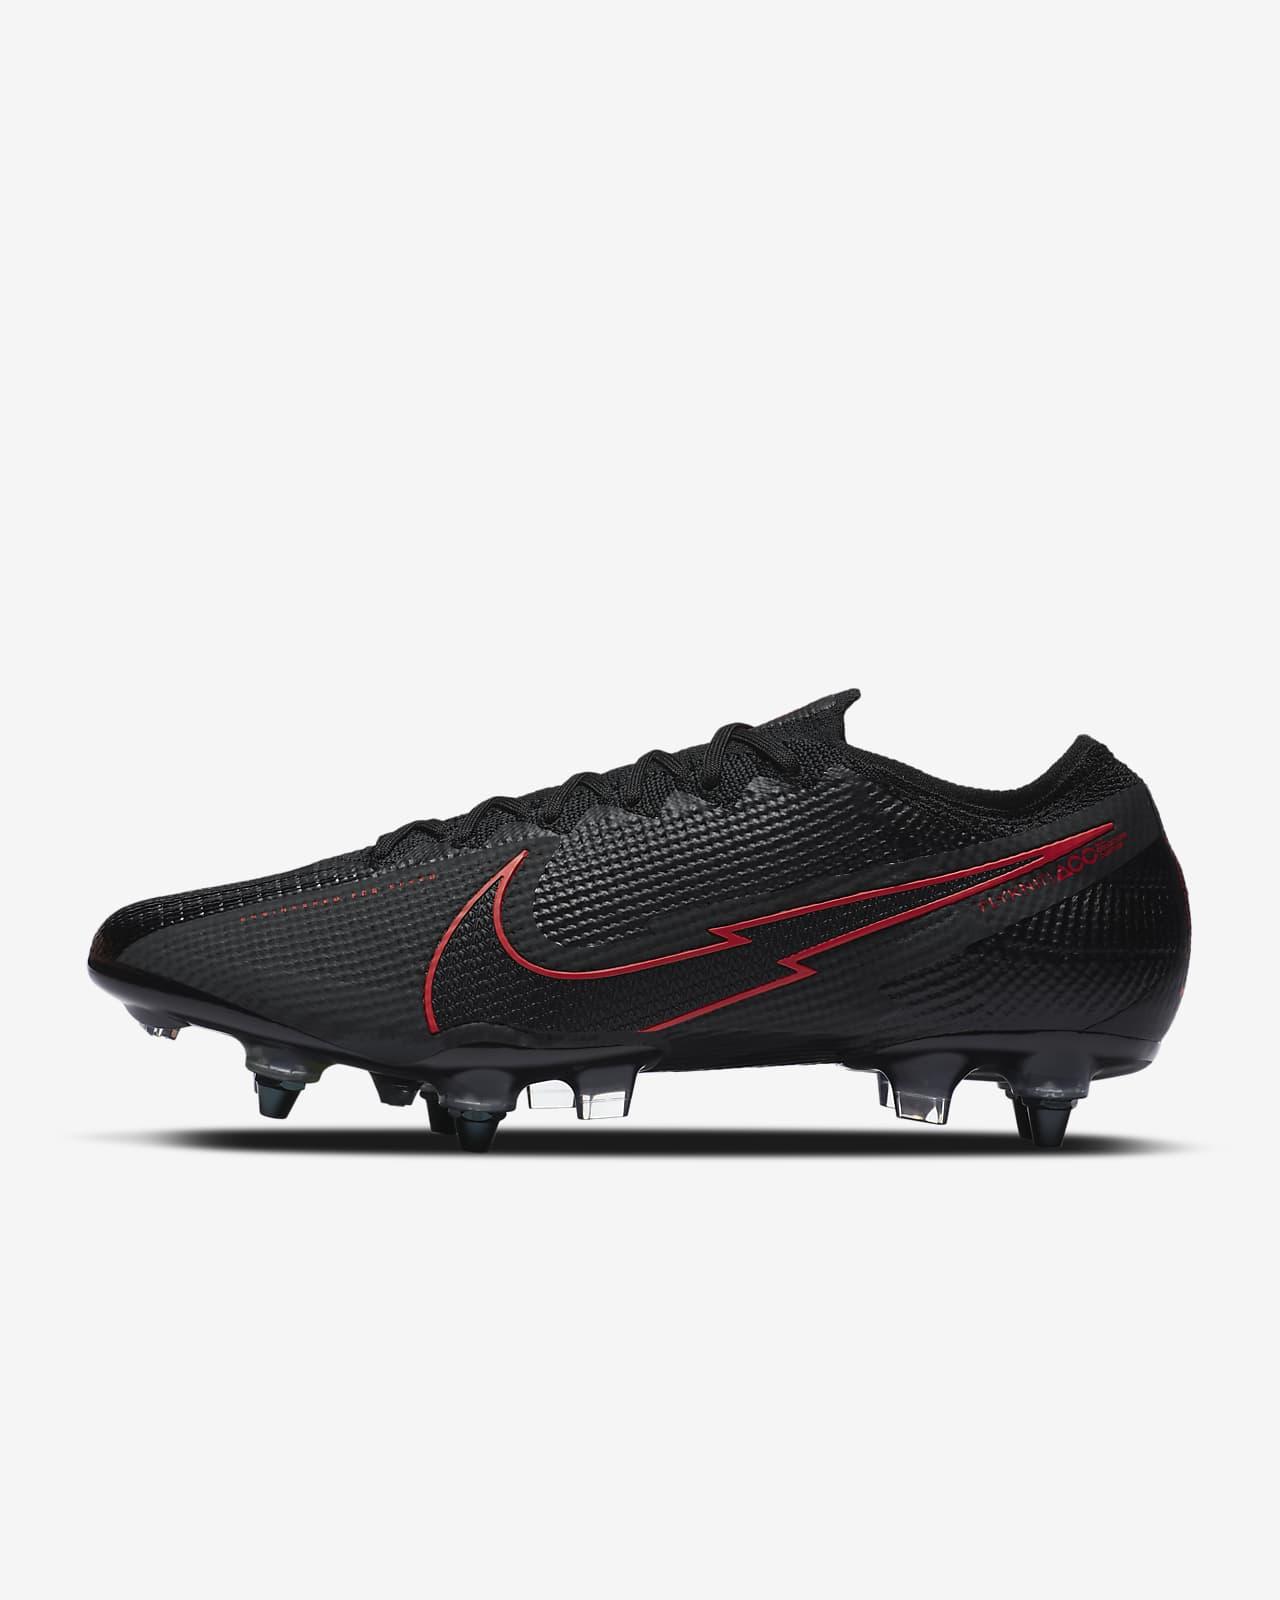 Nike Mercurial Vapor 13 Elite SG-PRO Anti-Clog Traction Soft-Ground Football Boots